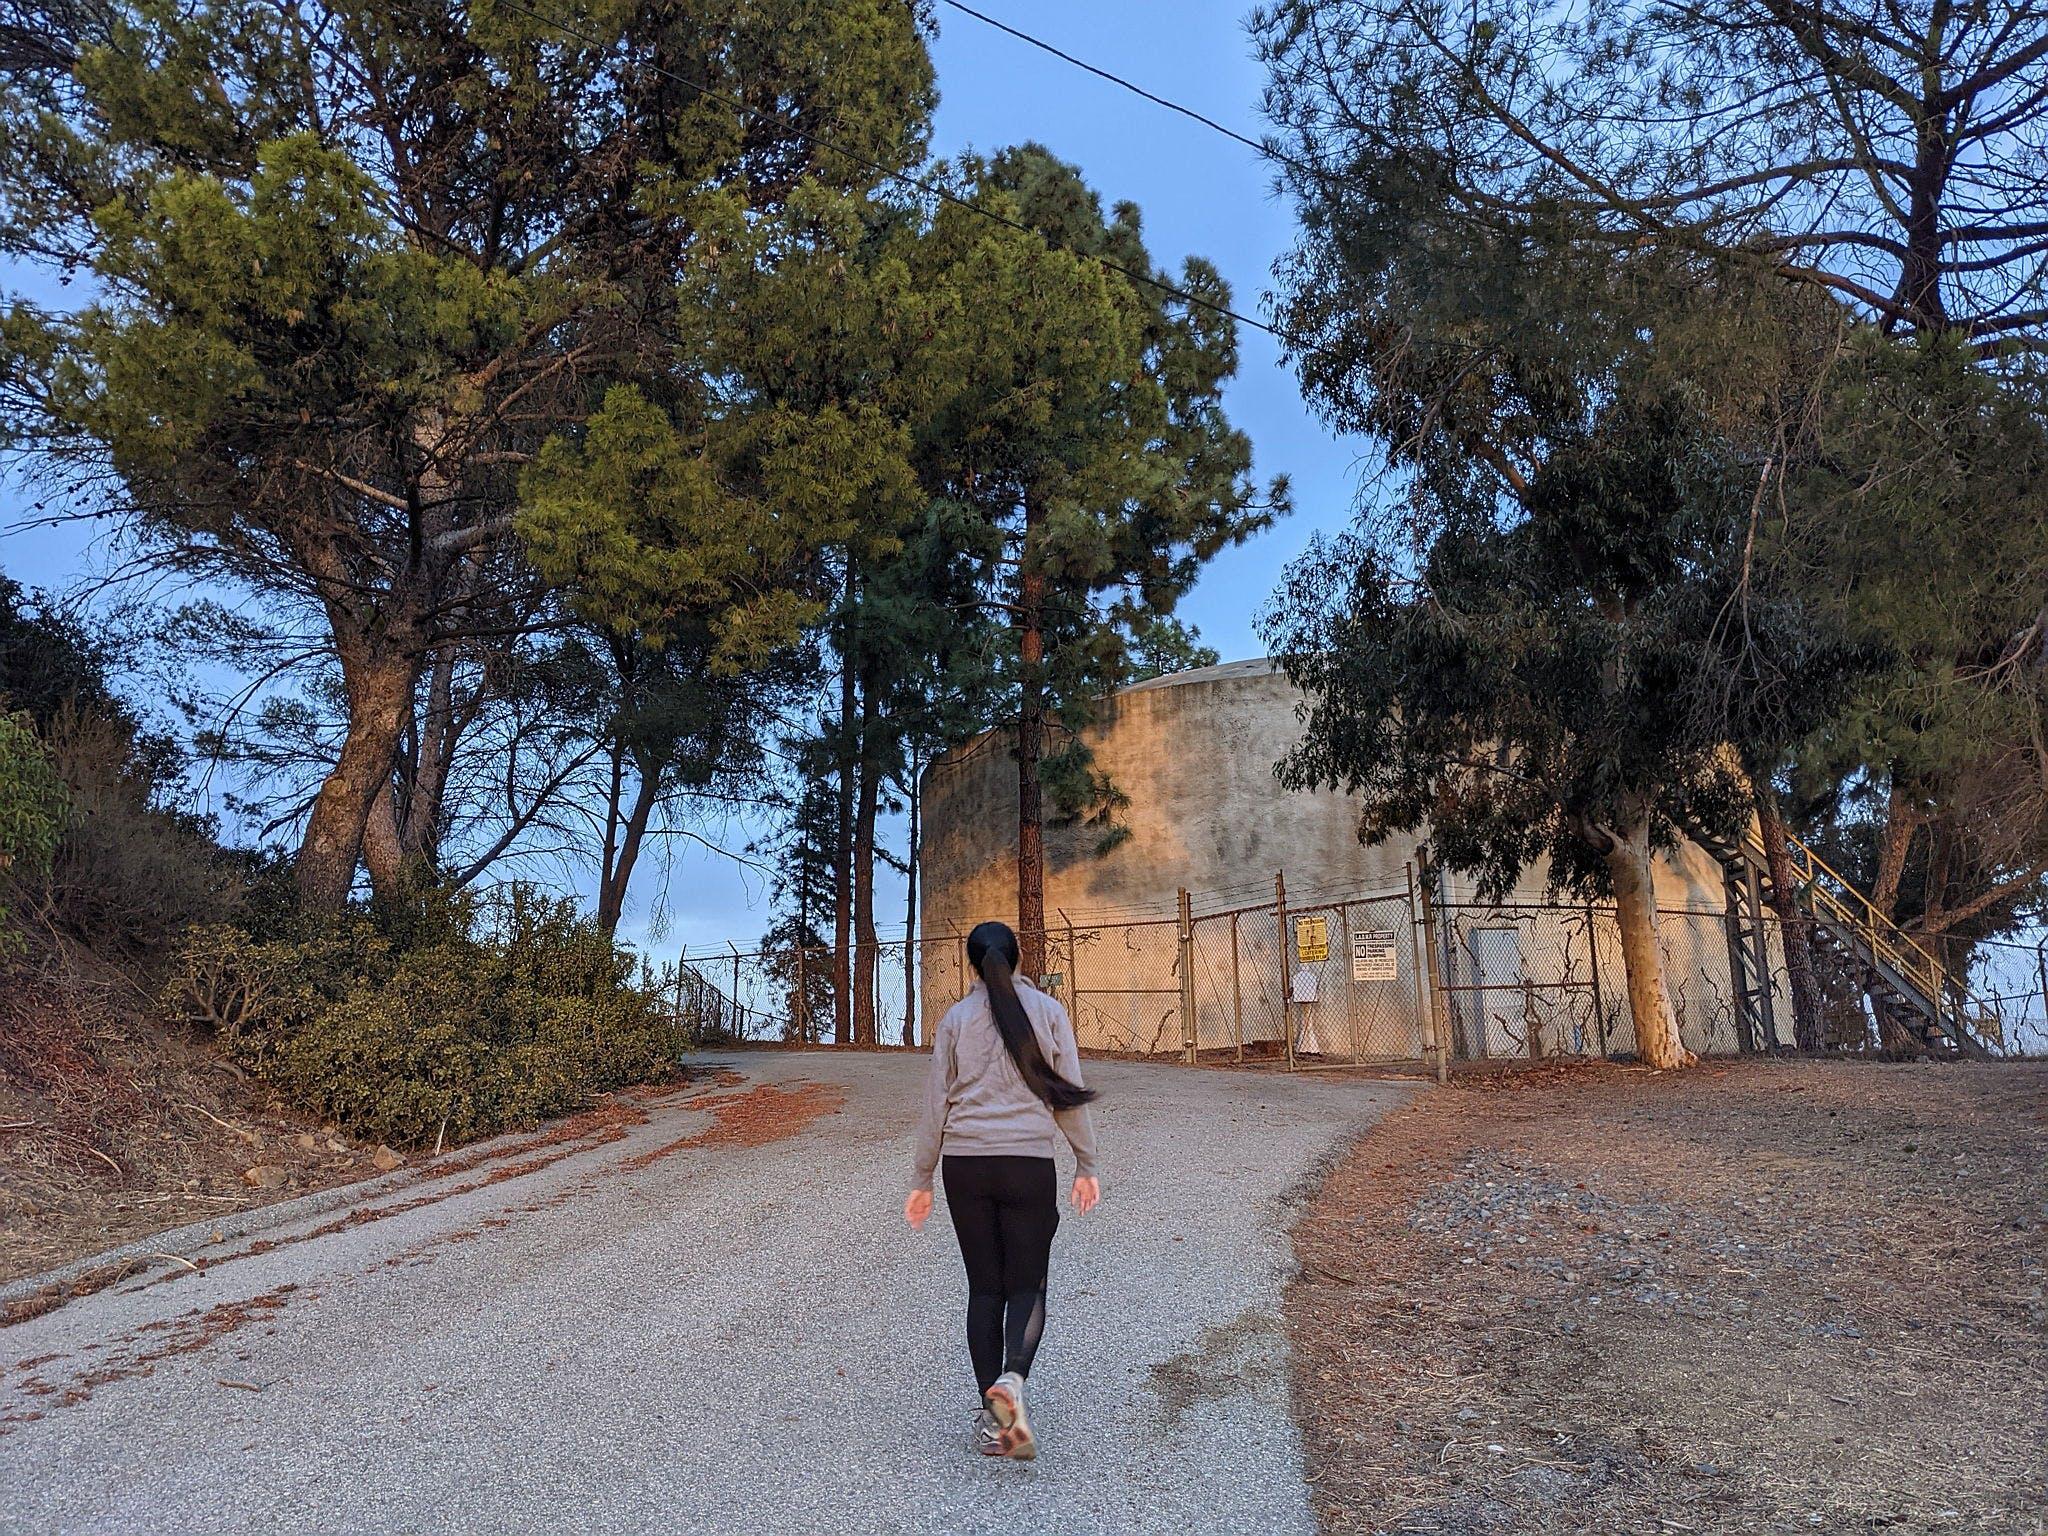 Woman hiking at Briar Summit Preserve in Los Angeles